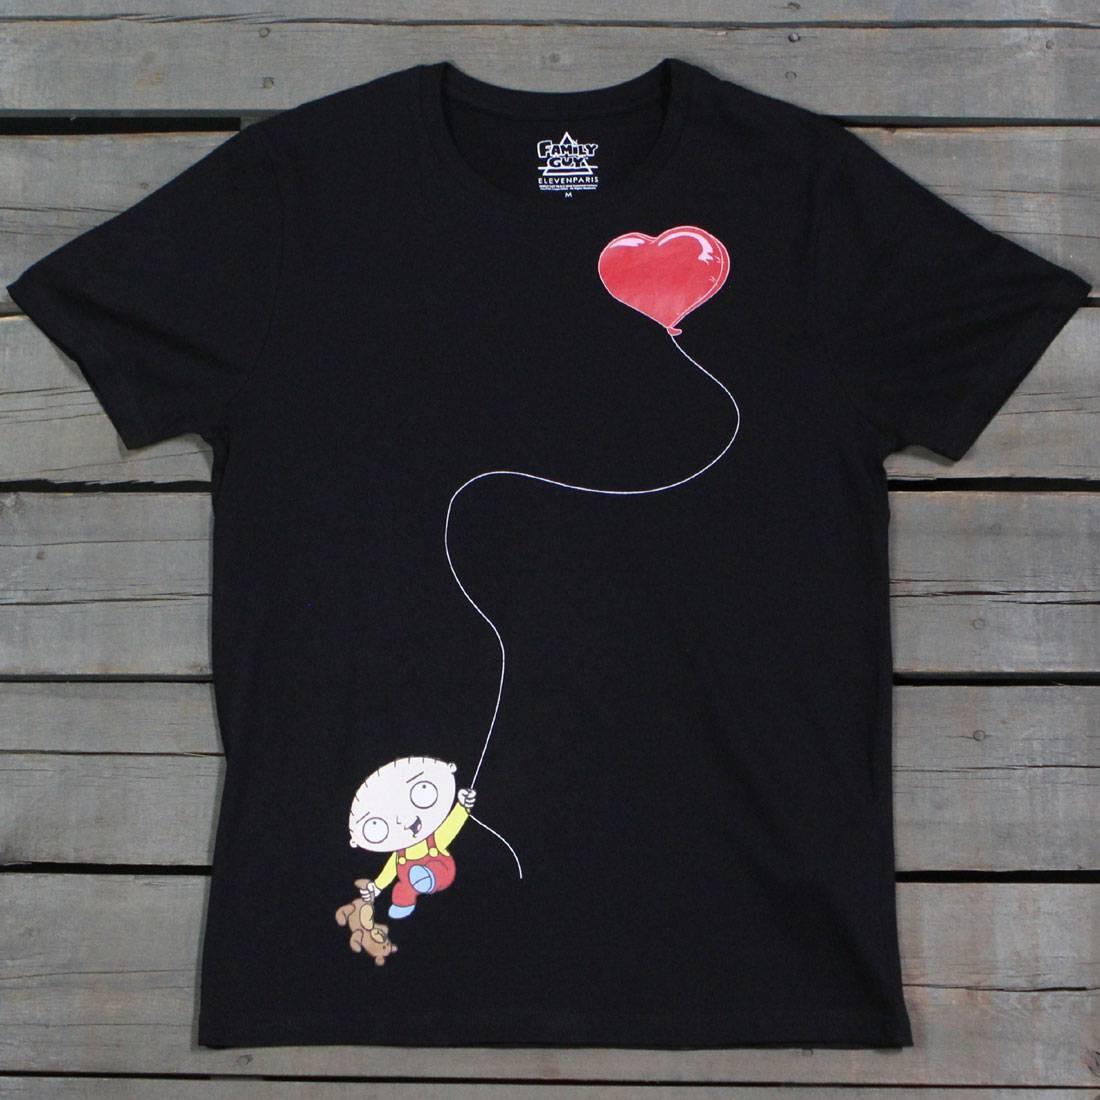 Tシャツ 黒 ブラック 【 BLACK ELEVEN PARIS X FAMILY GUY MEN STEWIE LOVE BALLOON TEE 】 メンズファッション トップス Tシャツ カットソー